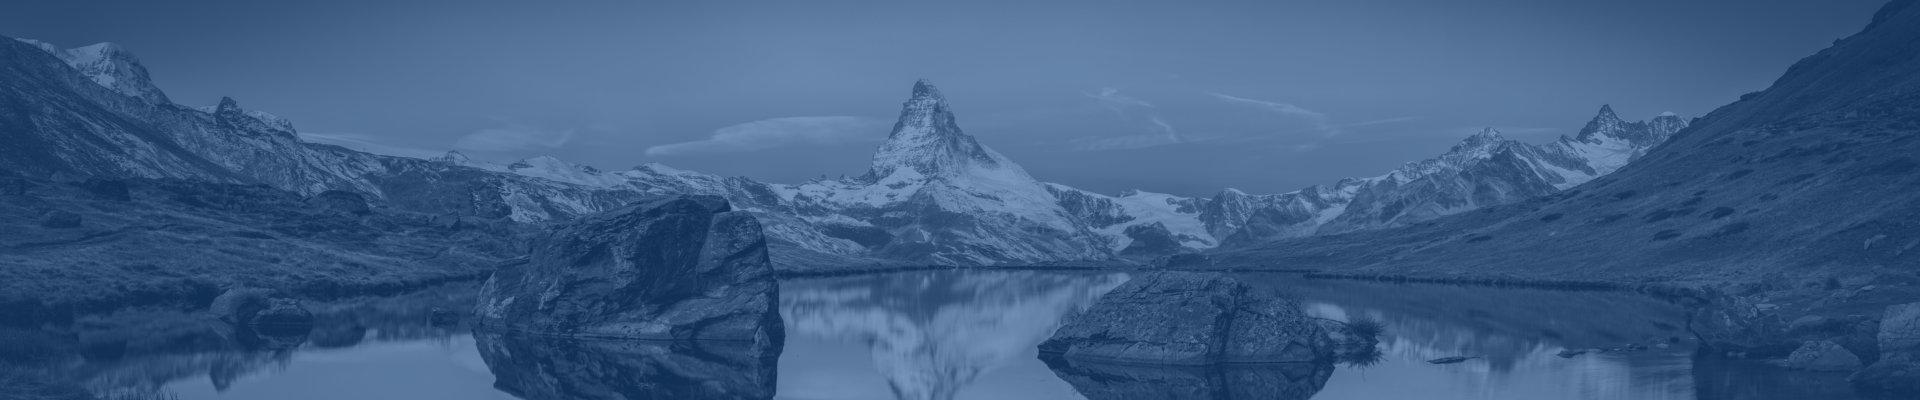 Header Image - Matterhorn Panorama (Blue)